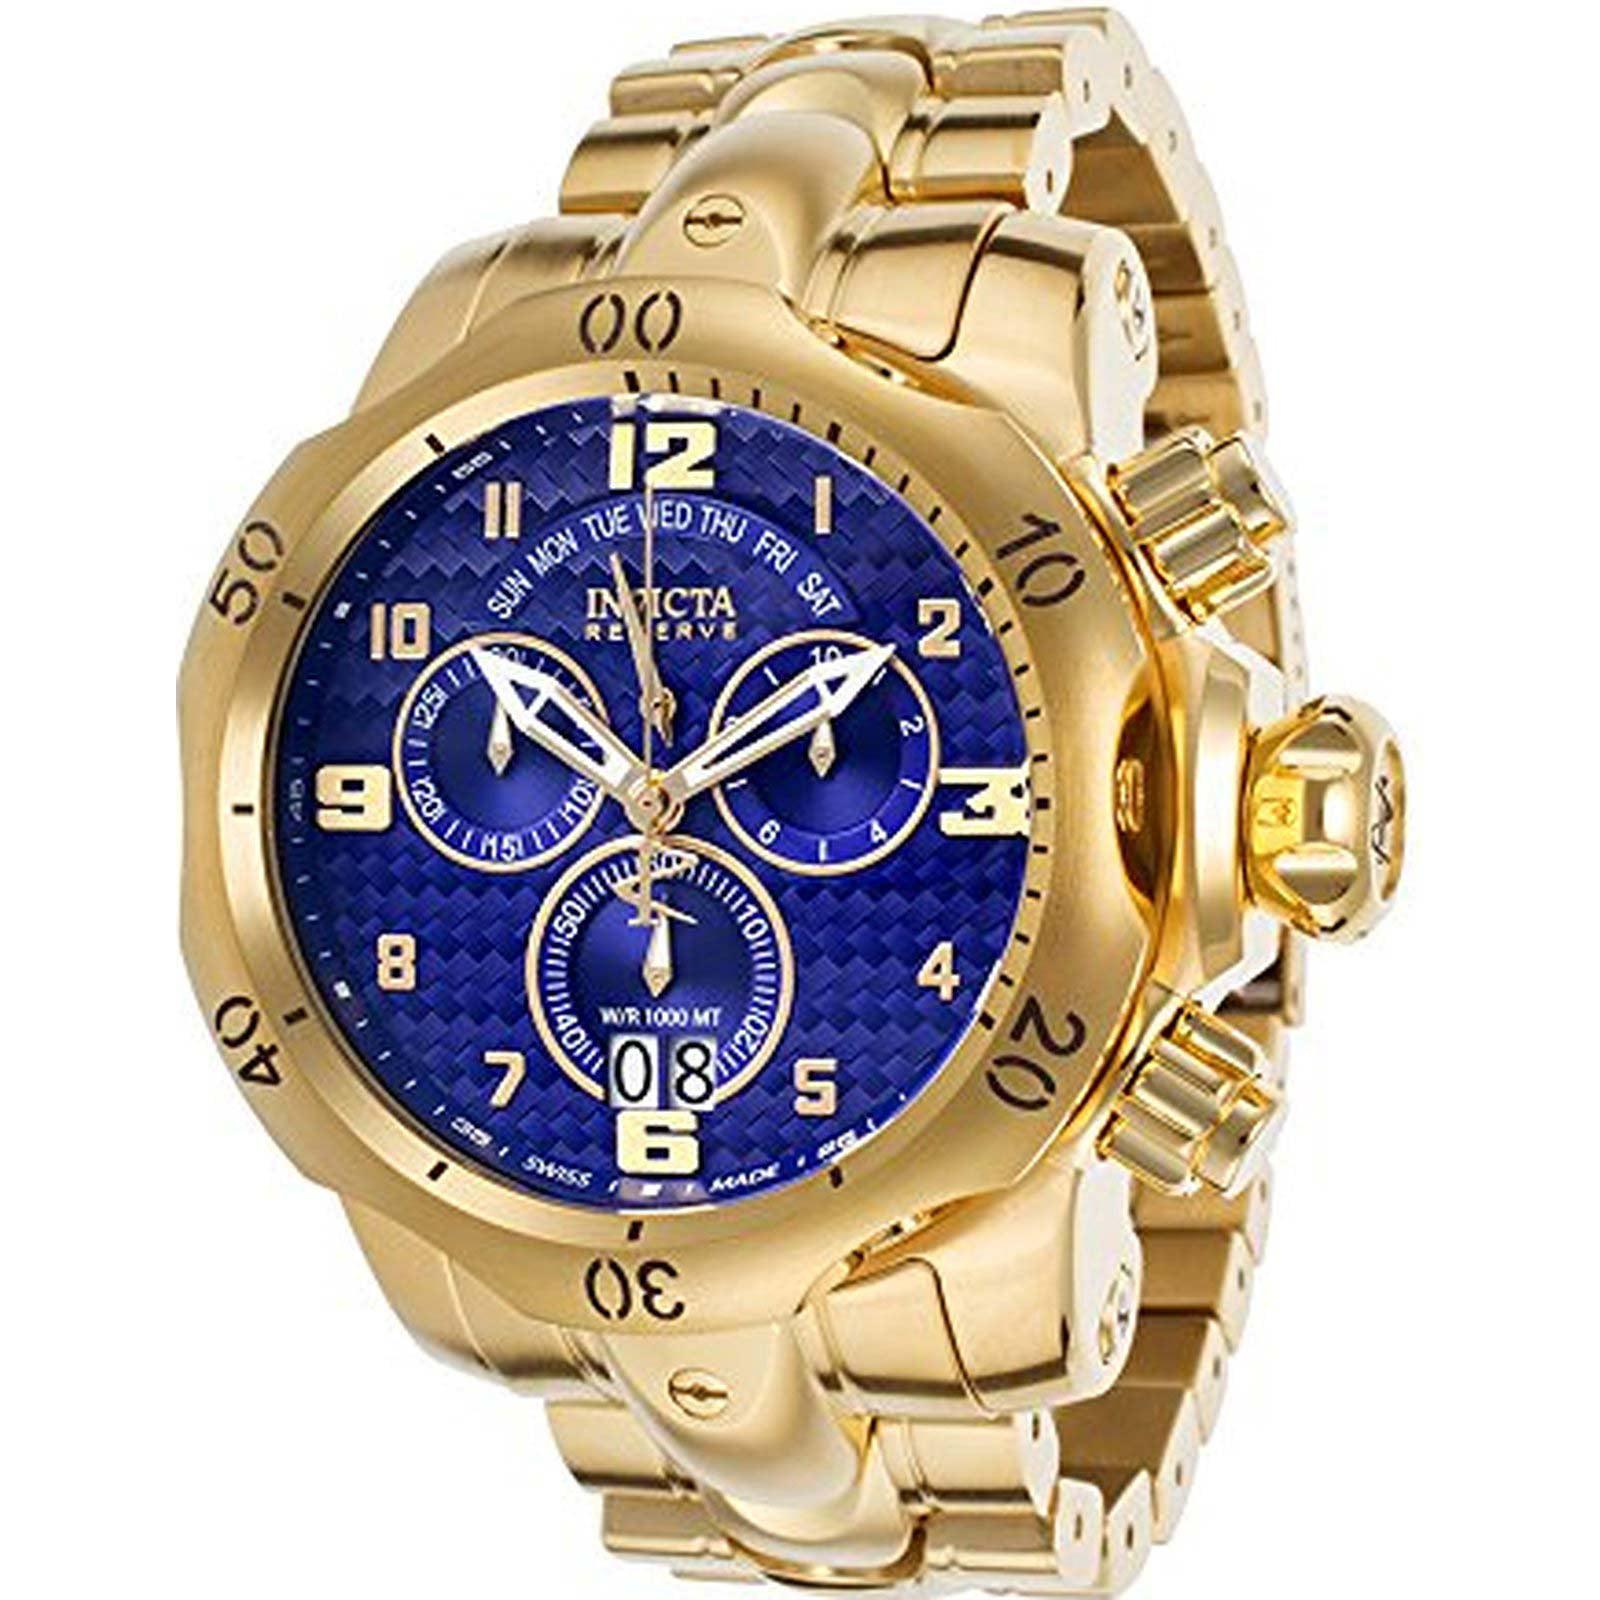 Invicta Men's 17635 Venom Quartz Chronograph Blue Dial Watch